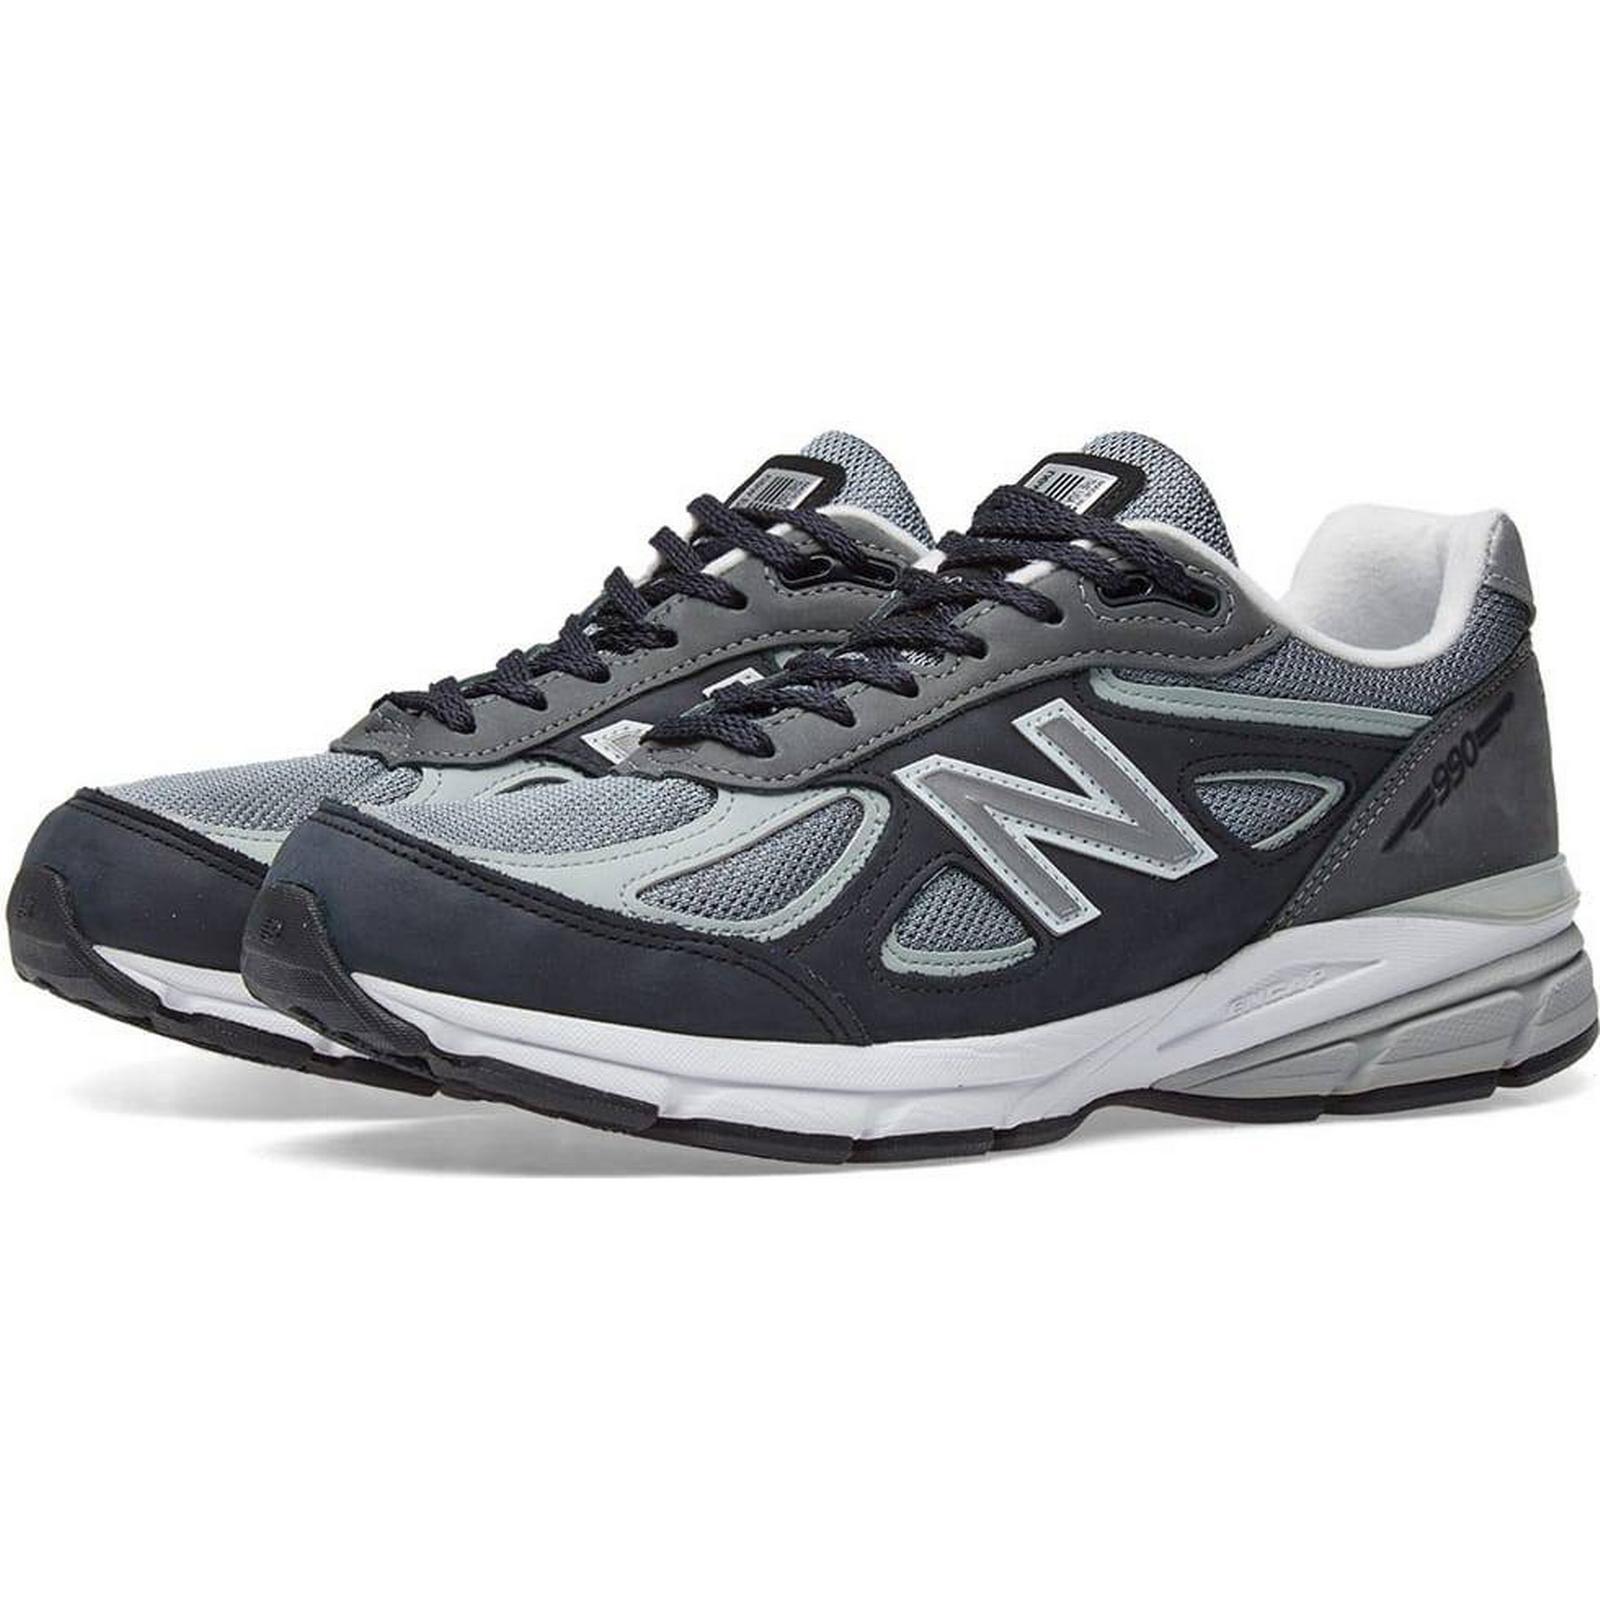 Gentlemen/Ladies:New M990XG4 Balance M990XG4 Gentlemen/Ladies:New Black:elegant form 68127e